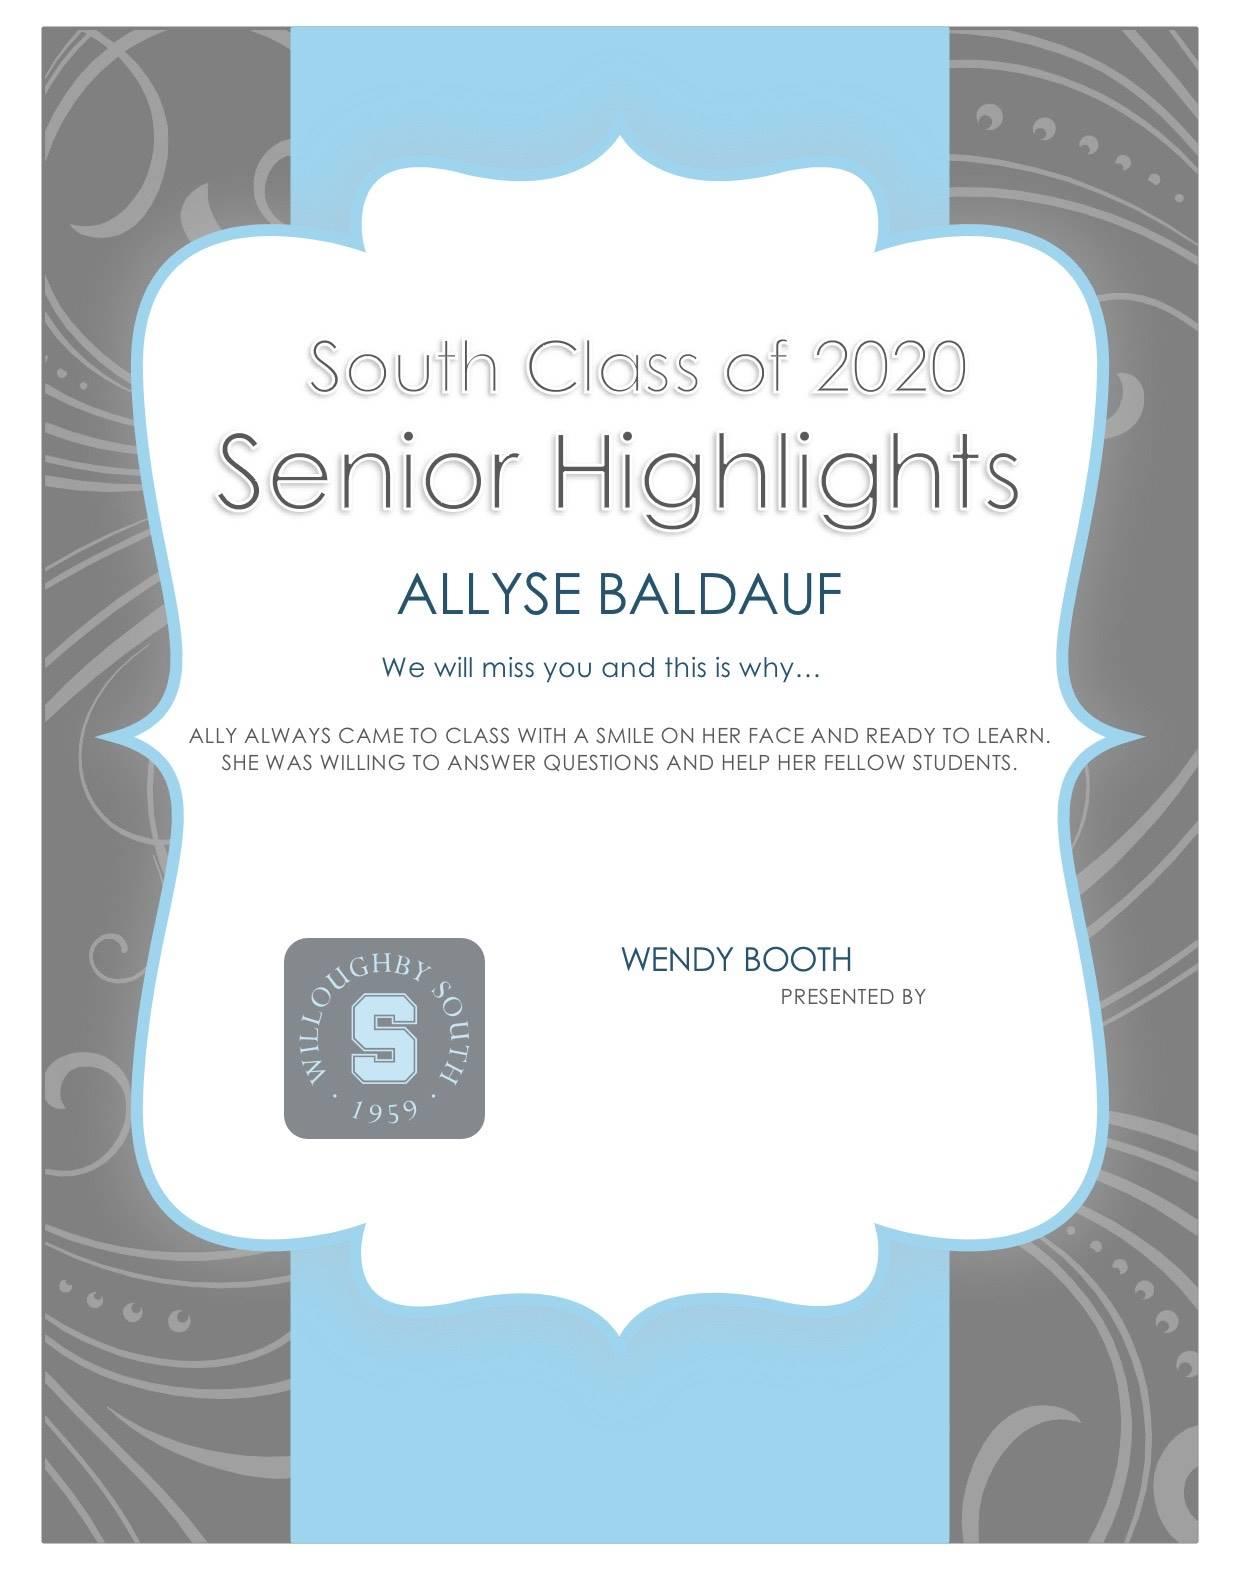 Allyse Baldauf